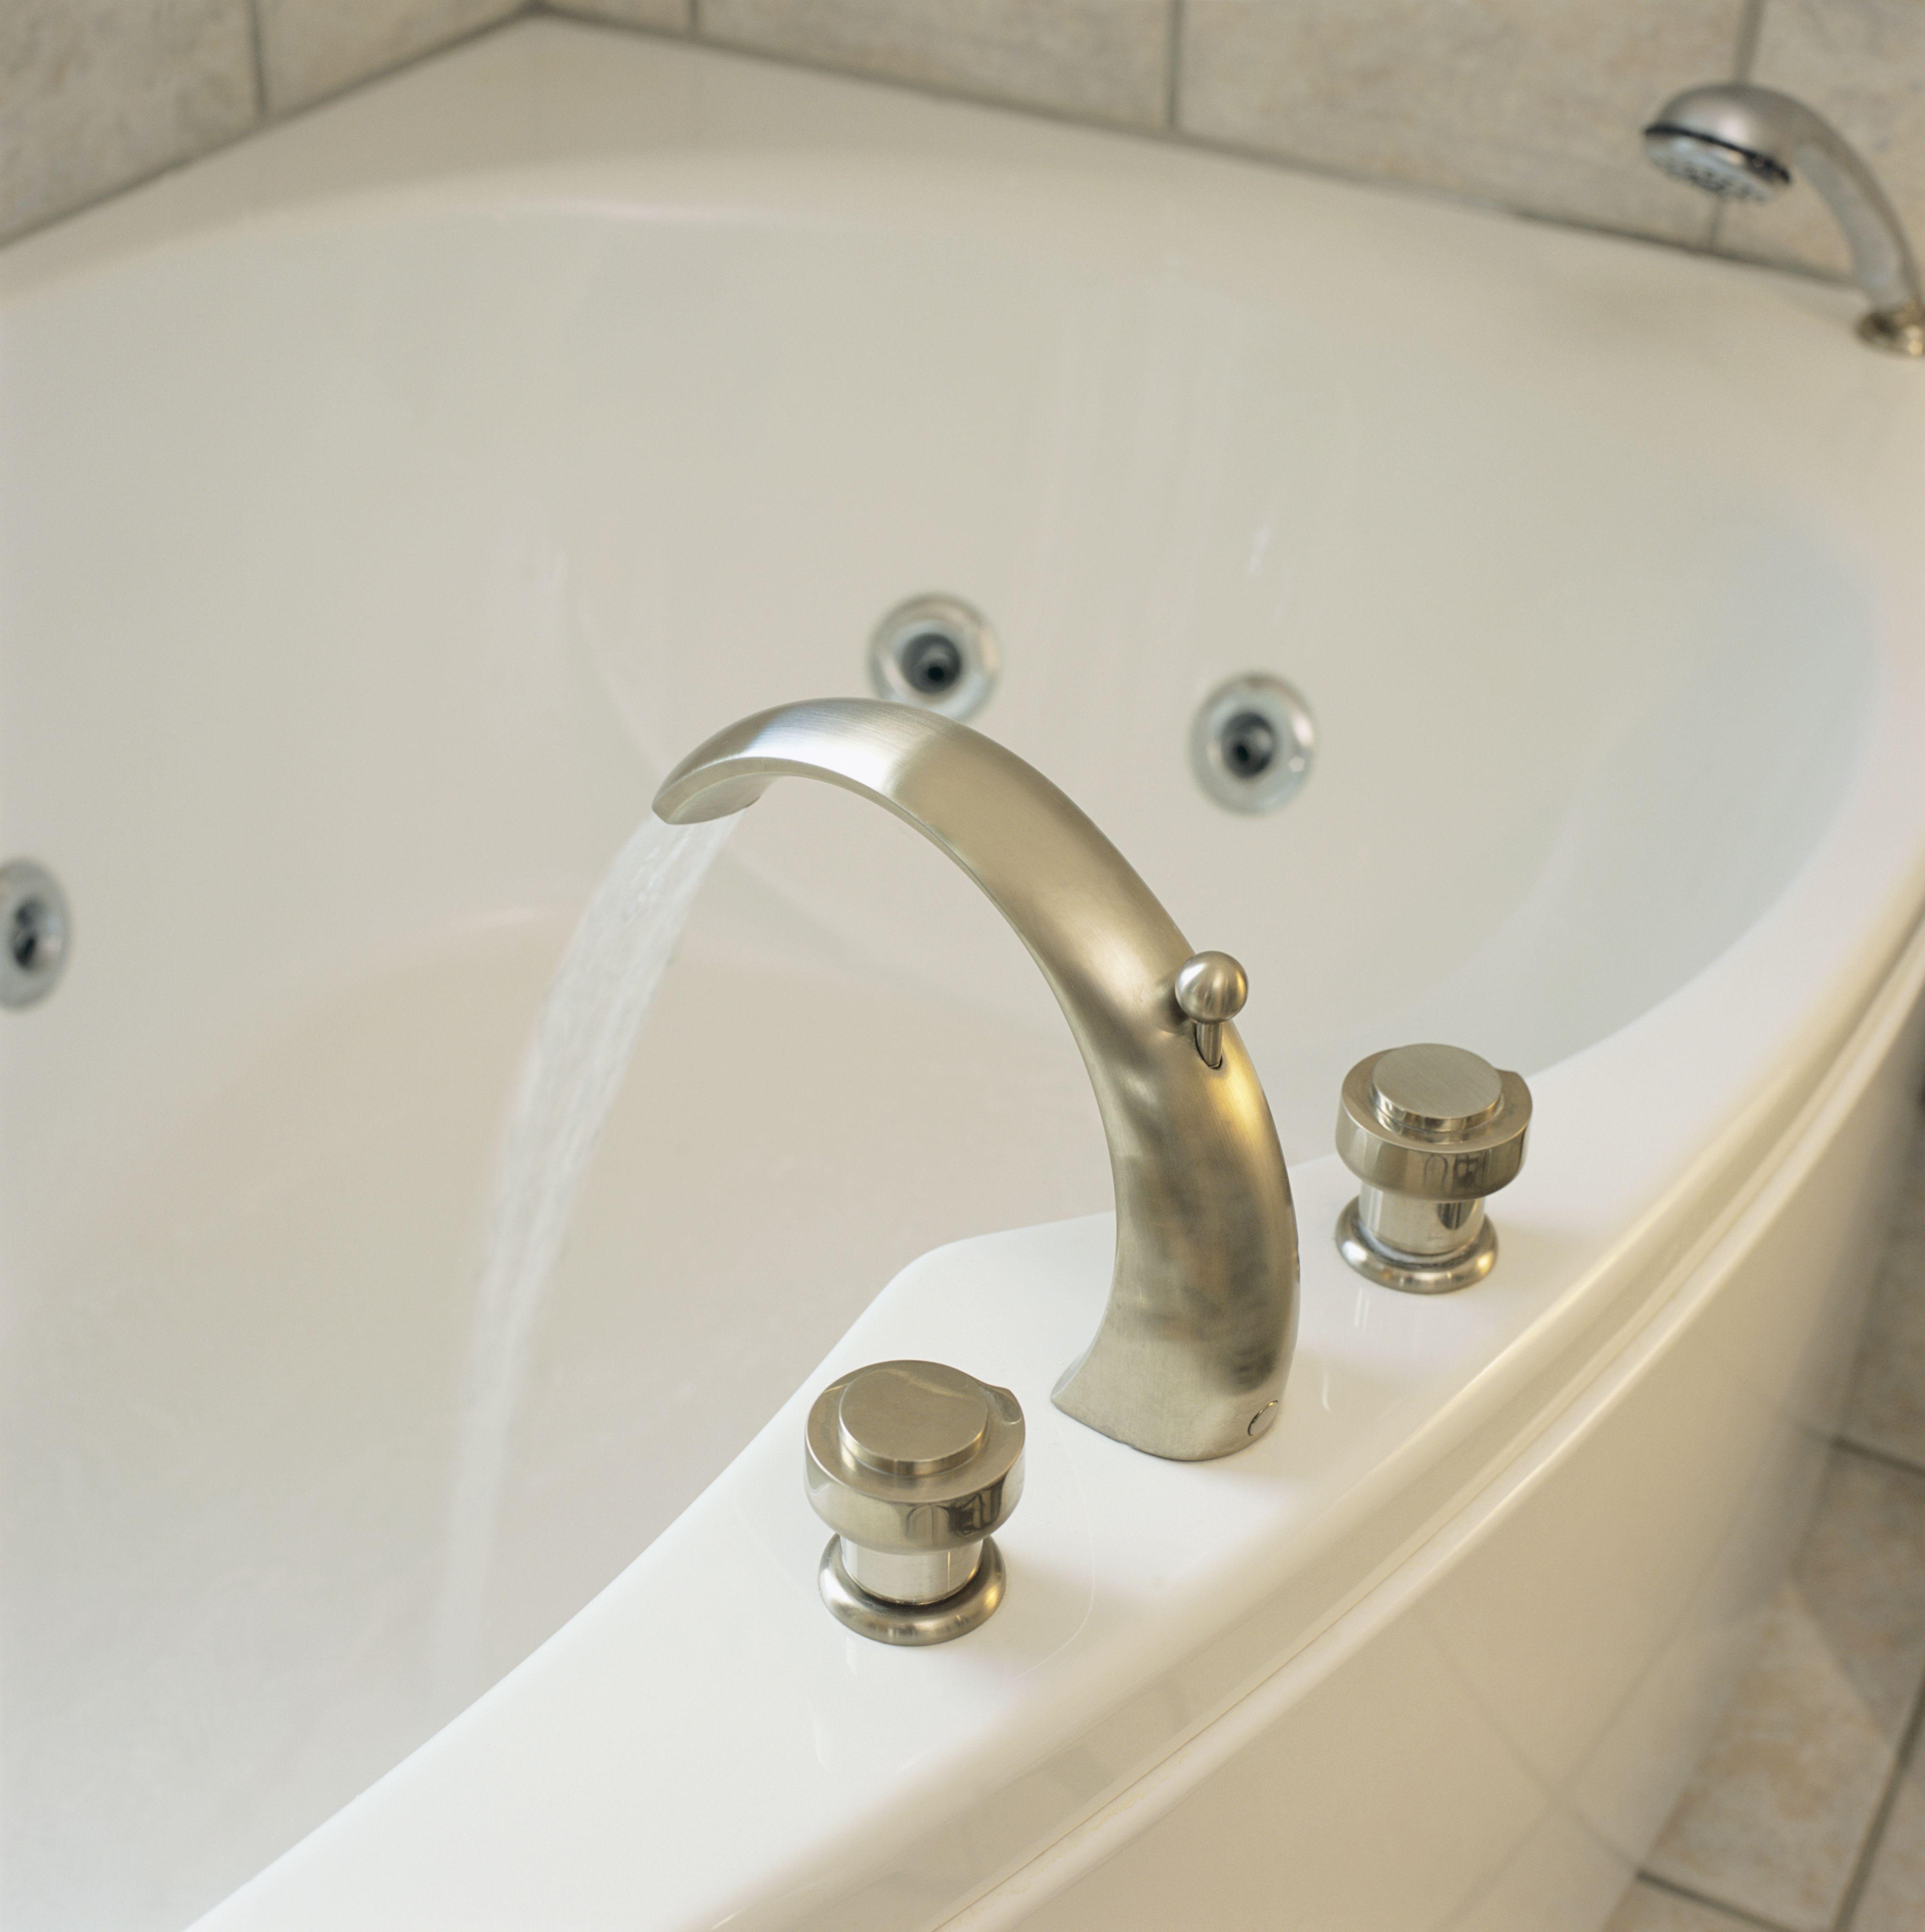 How to Fix a Leaky Bathtub Overflow Tube